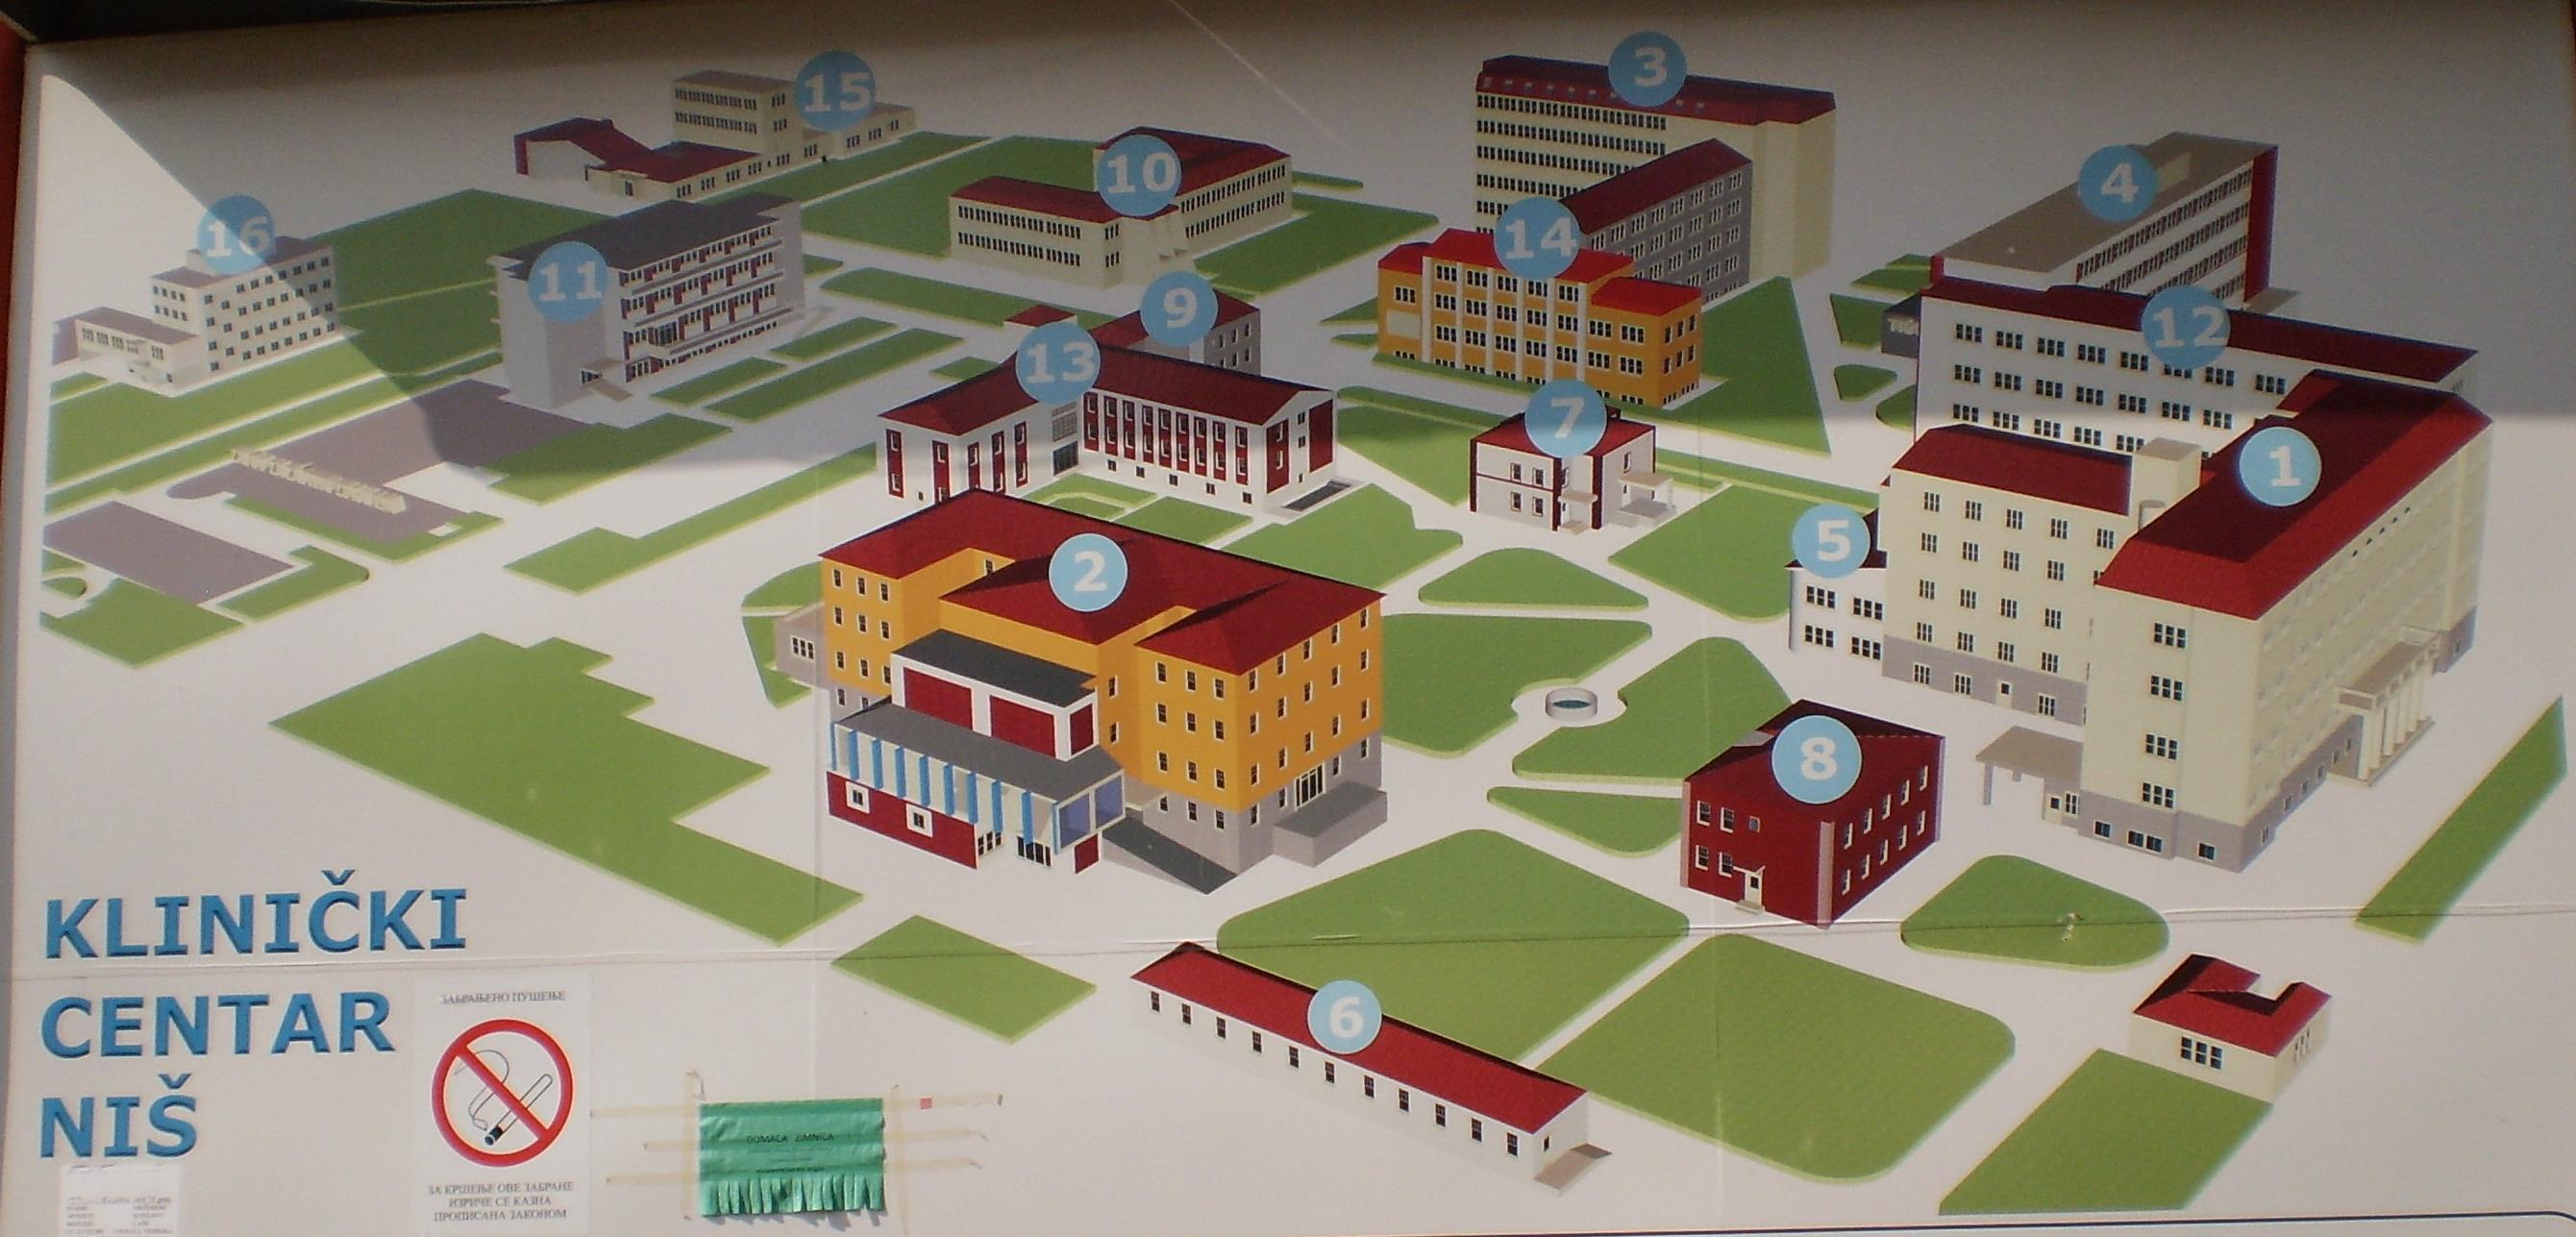 Mapa Klinickog Centra Srbije Superjoden